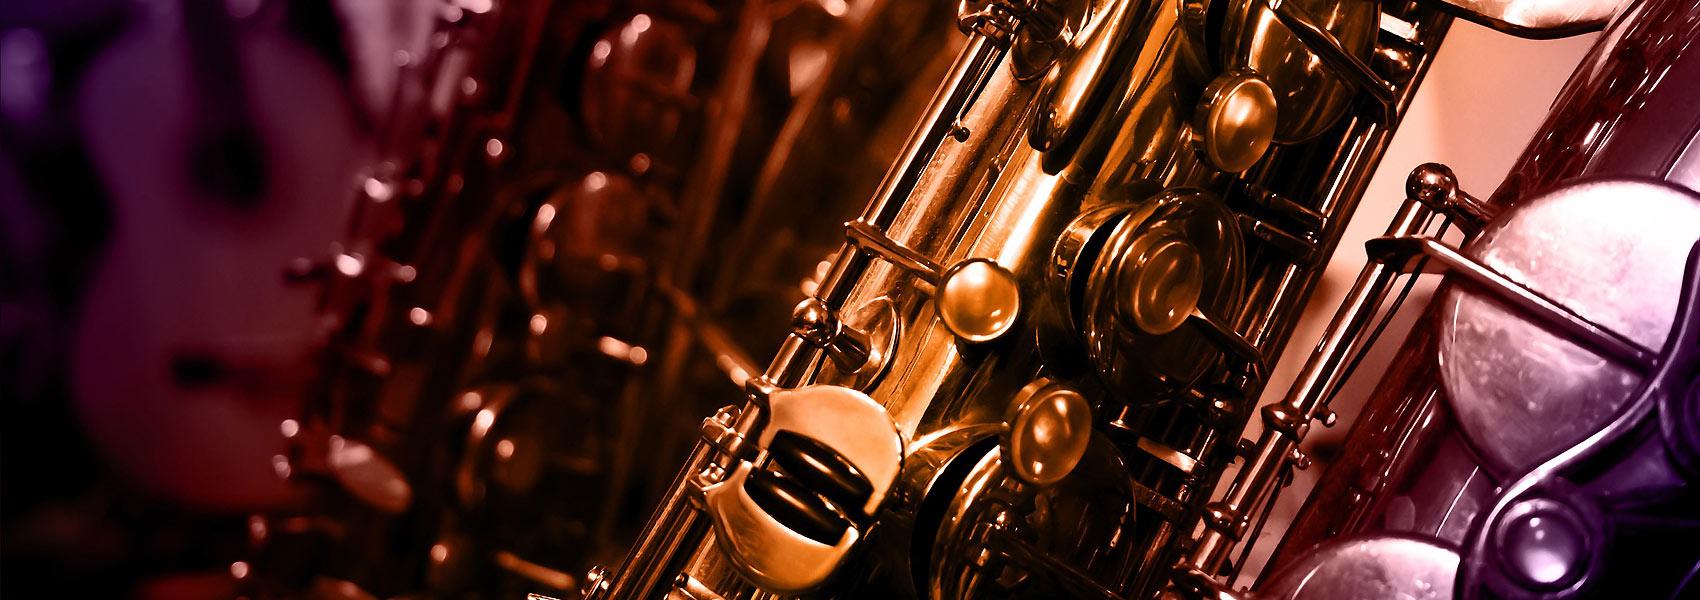 Rigotti France - Instrument reeds